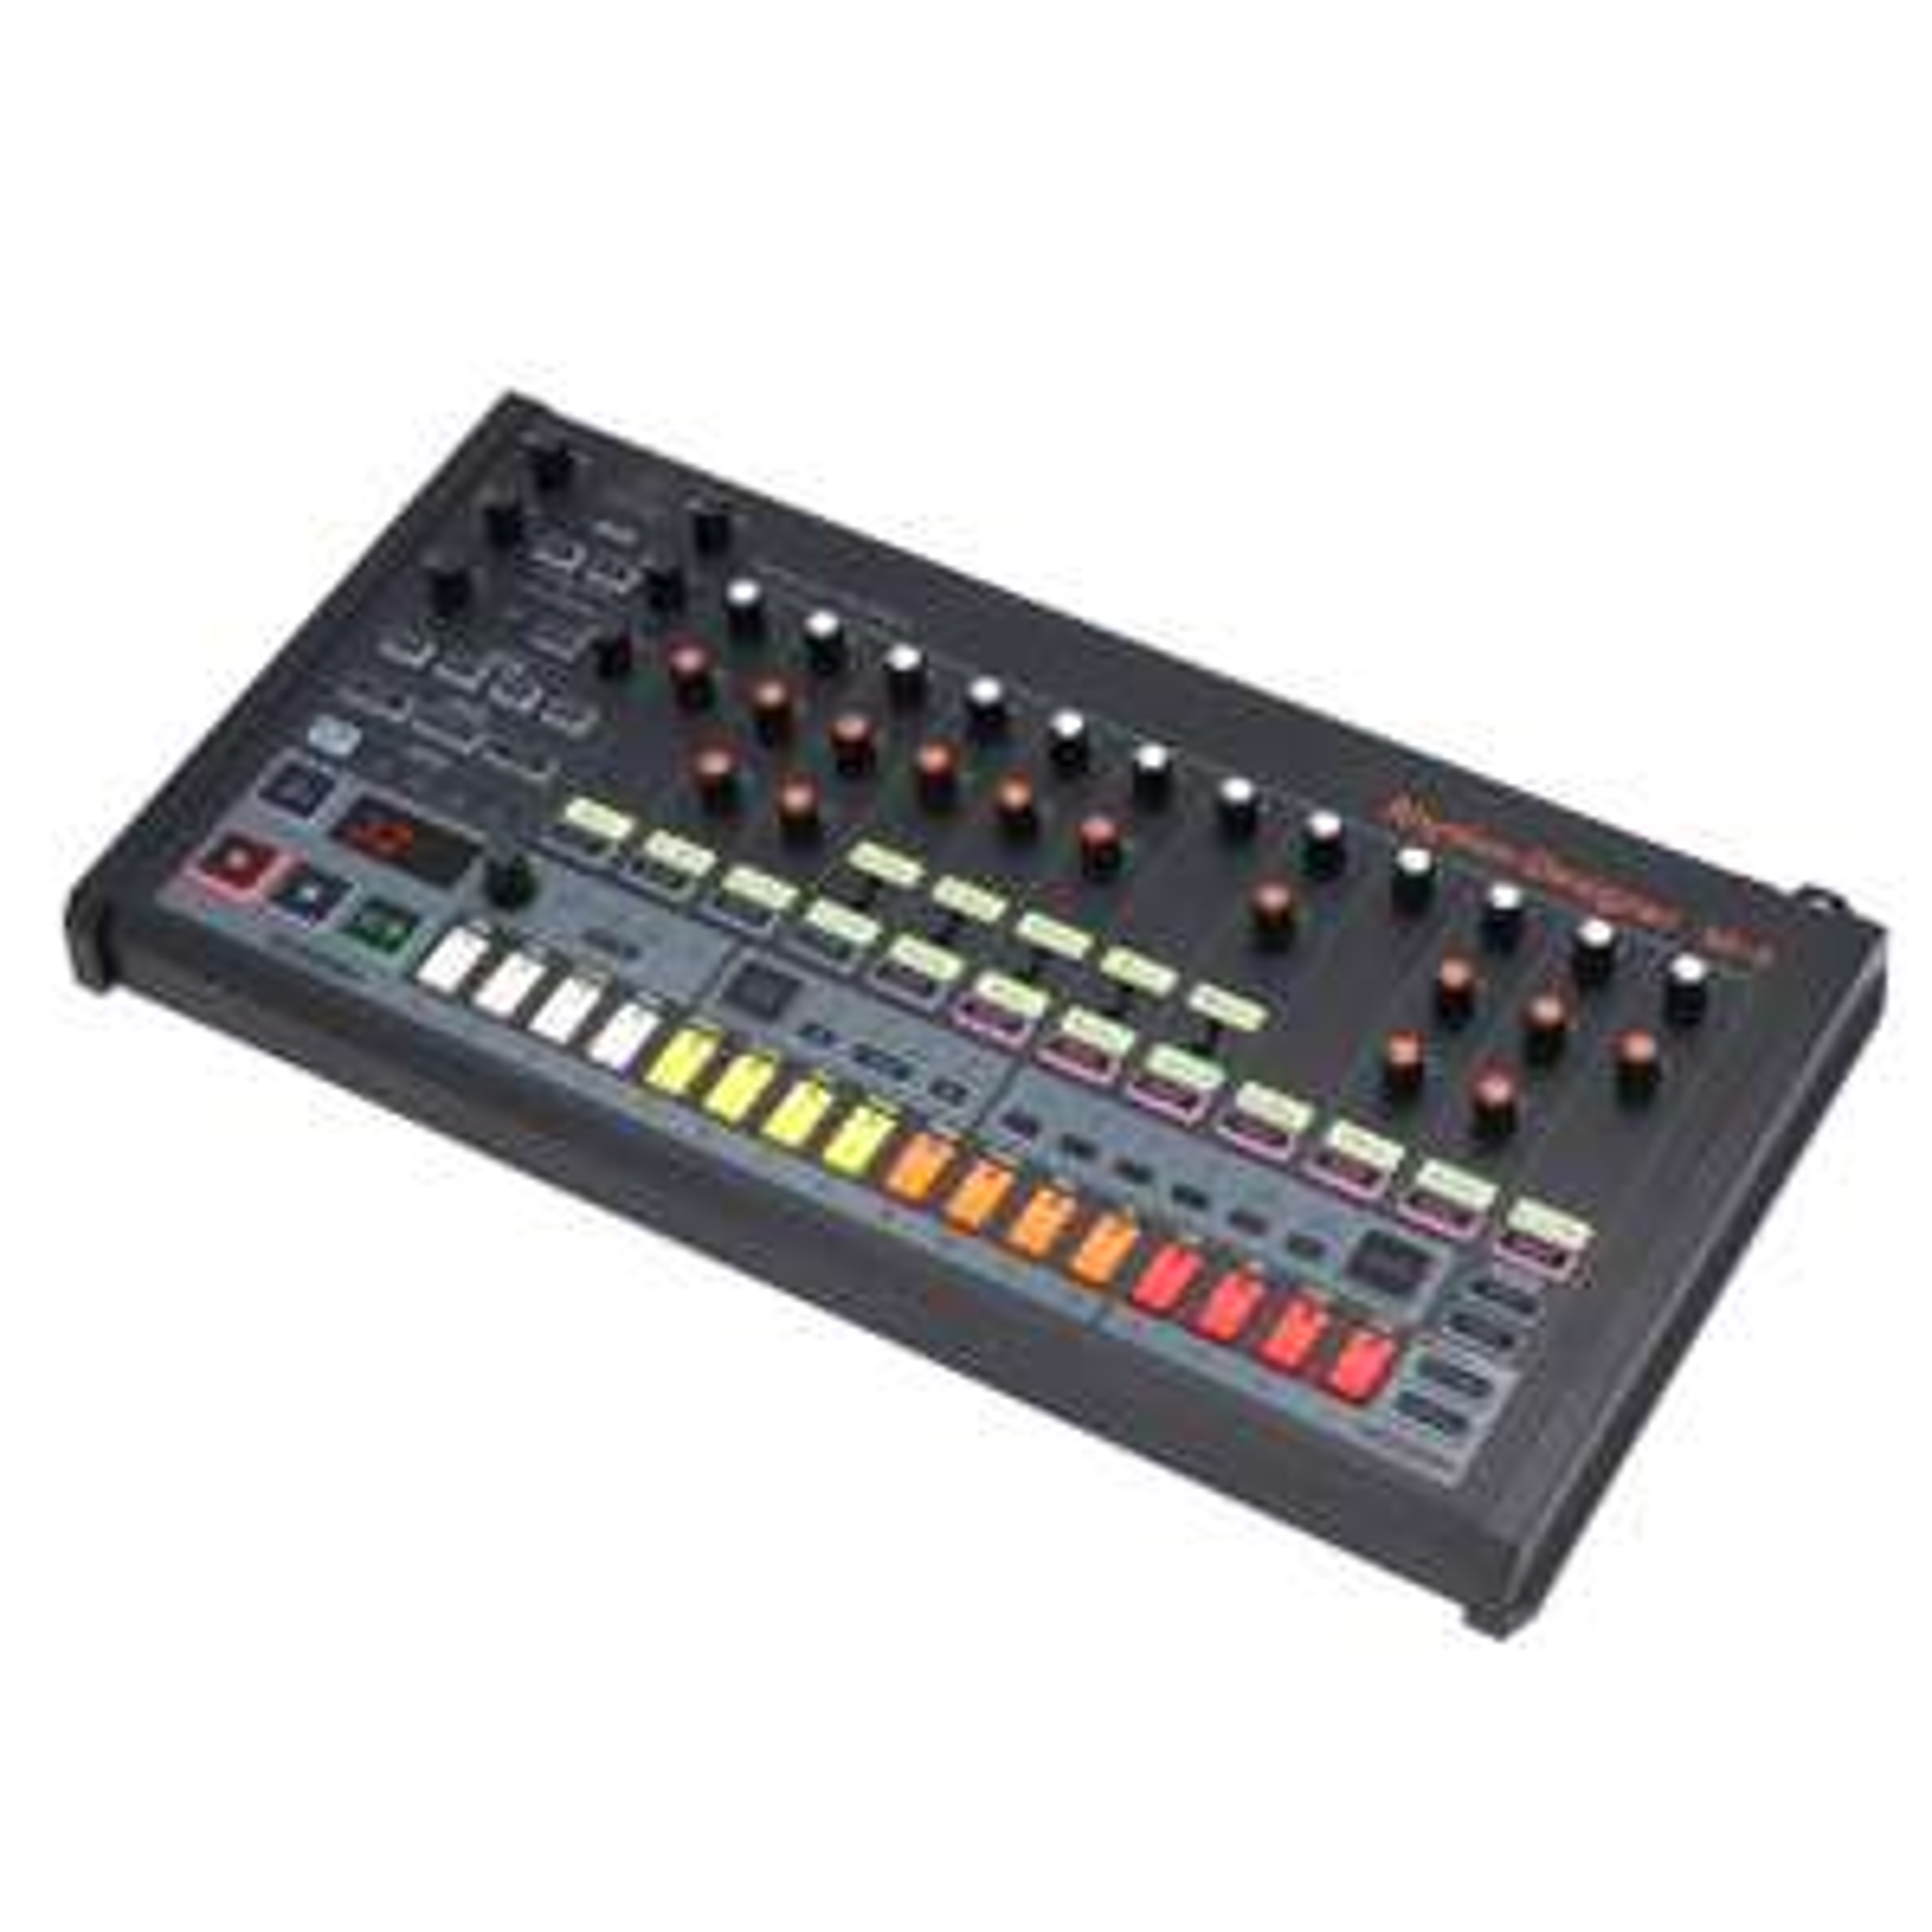 Behringer RD-8 drumcomputer